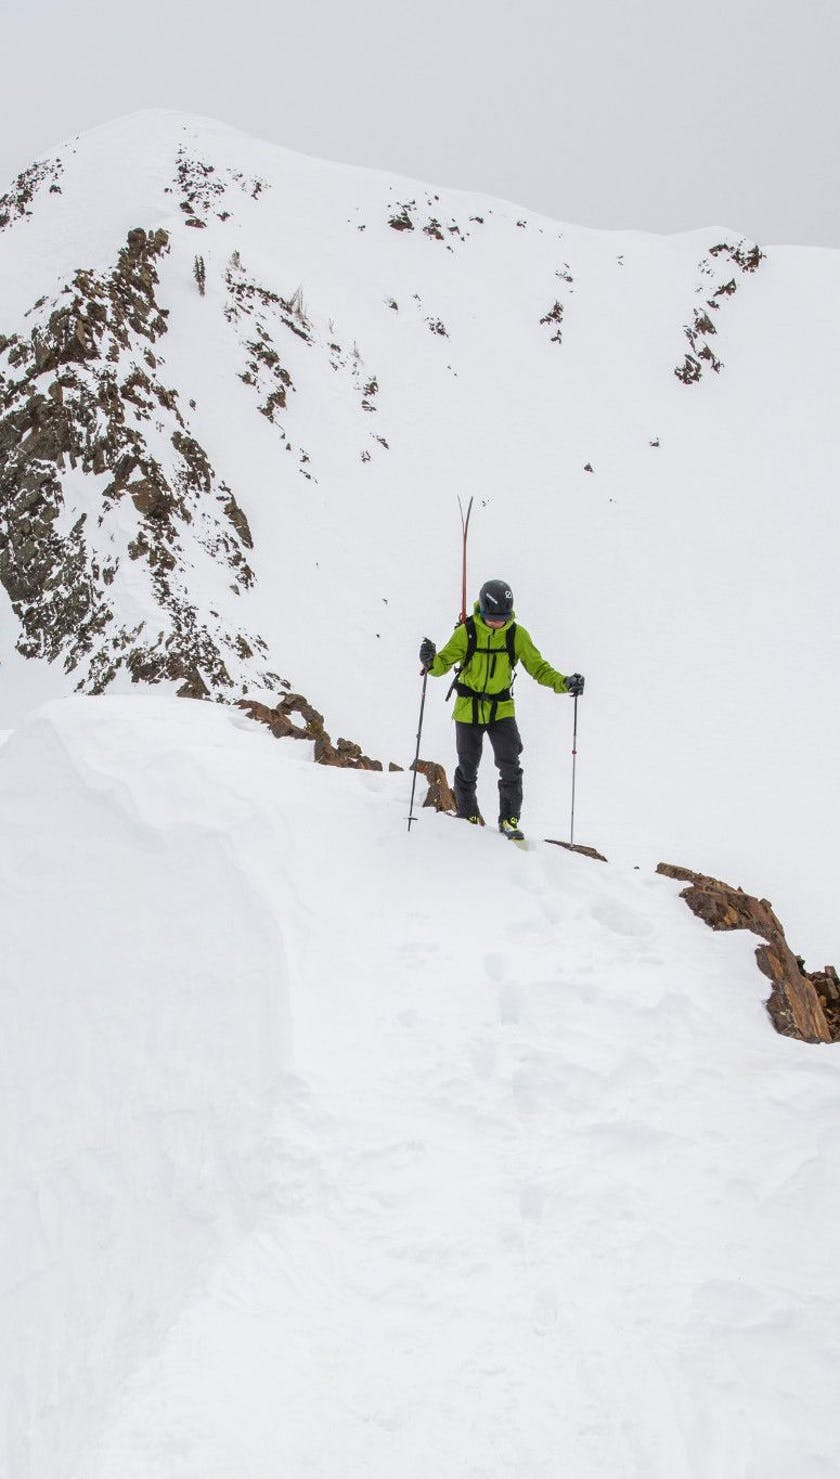 Person out ski touring